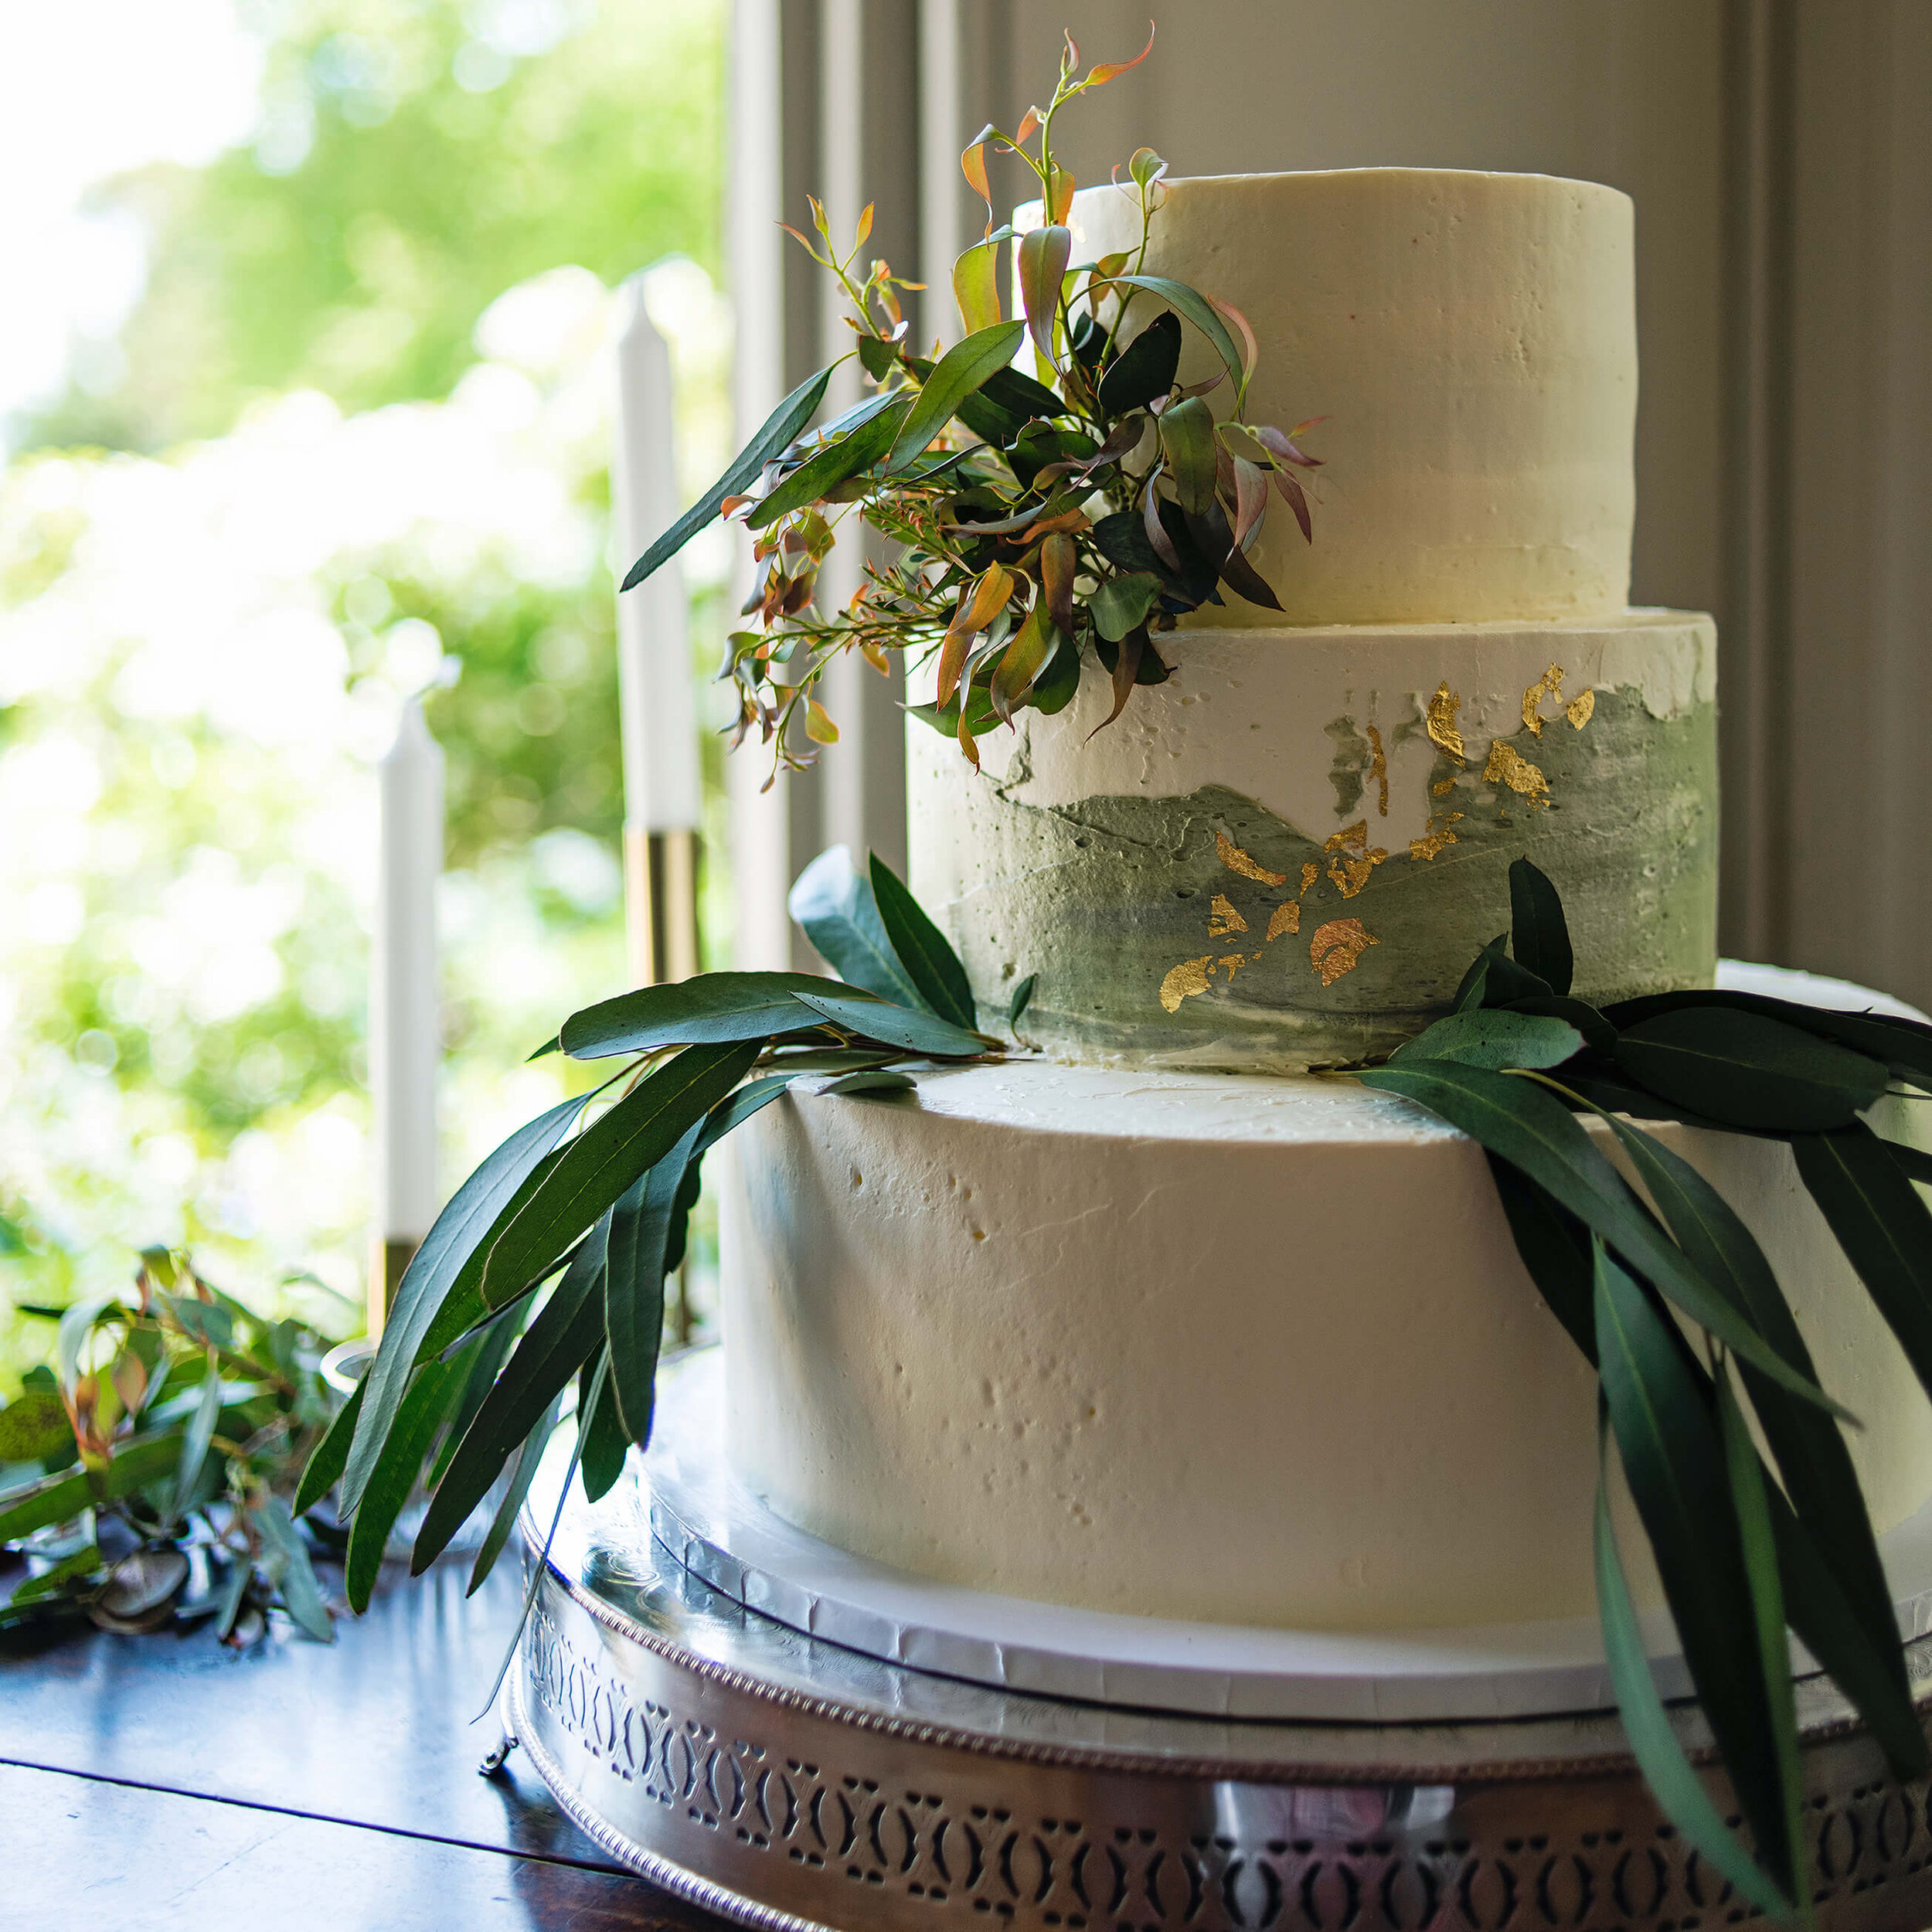 Cakes & Leaves Three Tier Eucalyptus Foliage and Gold Leaf Wedding Cake details at Nurstead Court Wedding venue, Kent.